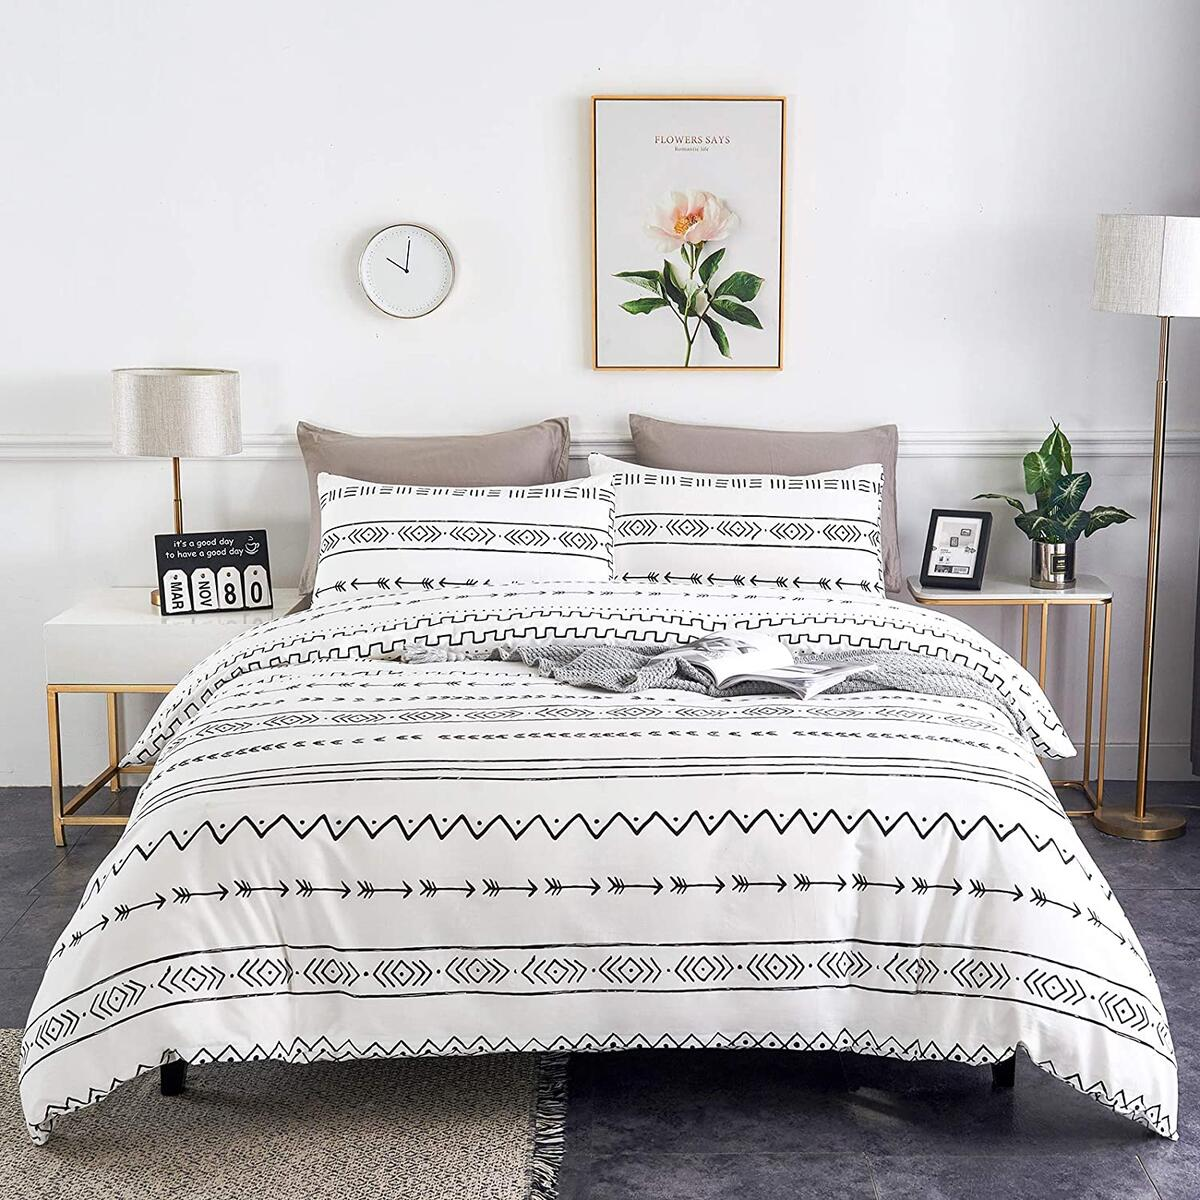 WARMDERN Black Stripe Boho Duvet Cover Set Queen, 3pcs Ultra Soft Breathable Aztec Cotton Comforter Cover with Zipper Ties, 1 Bohemian White Duvet Cover & 2 Pillowcase(Queen,White)